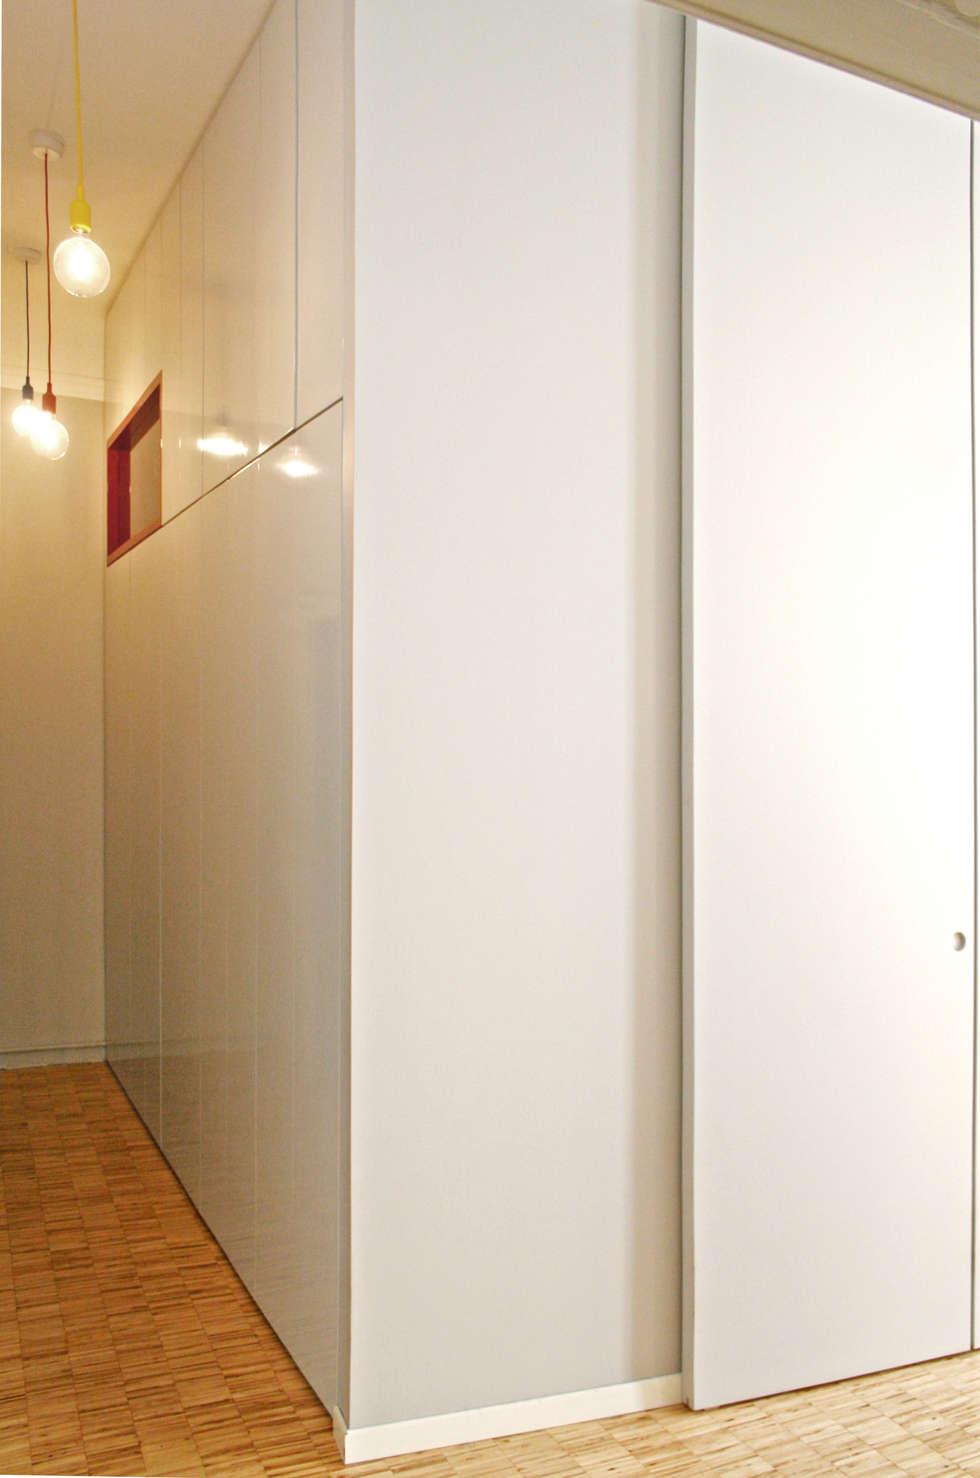 Armadiatura fissa sul corridoio: Ingresso & Corridoio in stile  di Atelier delle Verdure